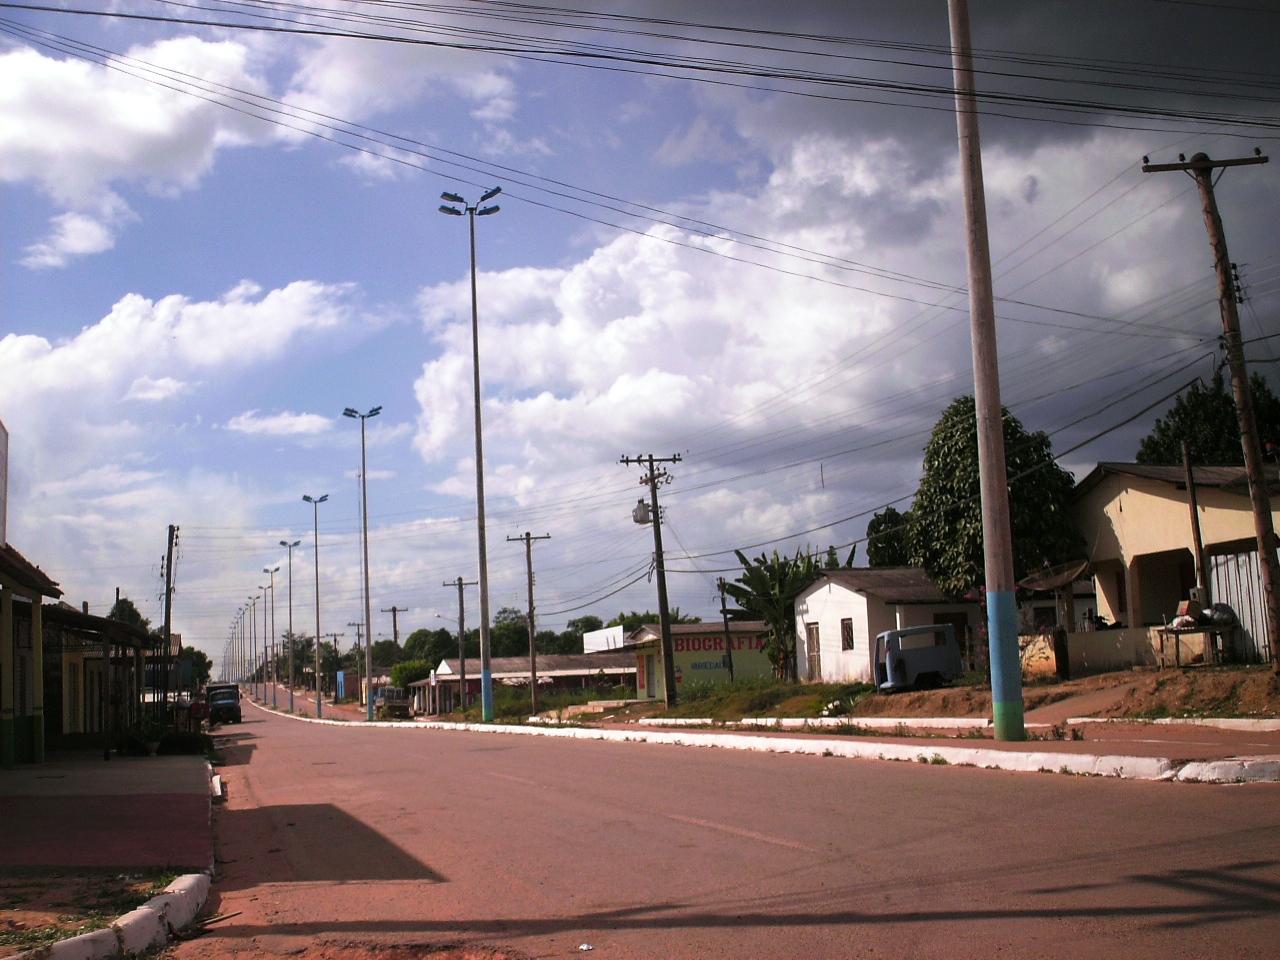 Rorainópolis Roraima fonte: upload.wikimedia.org